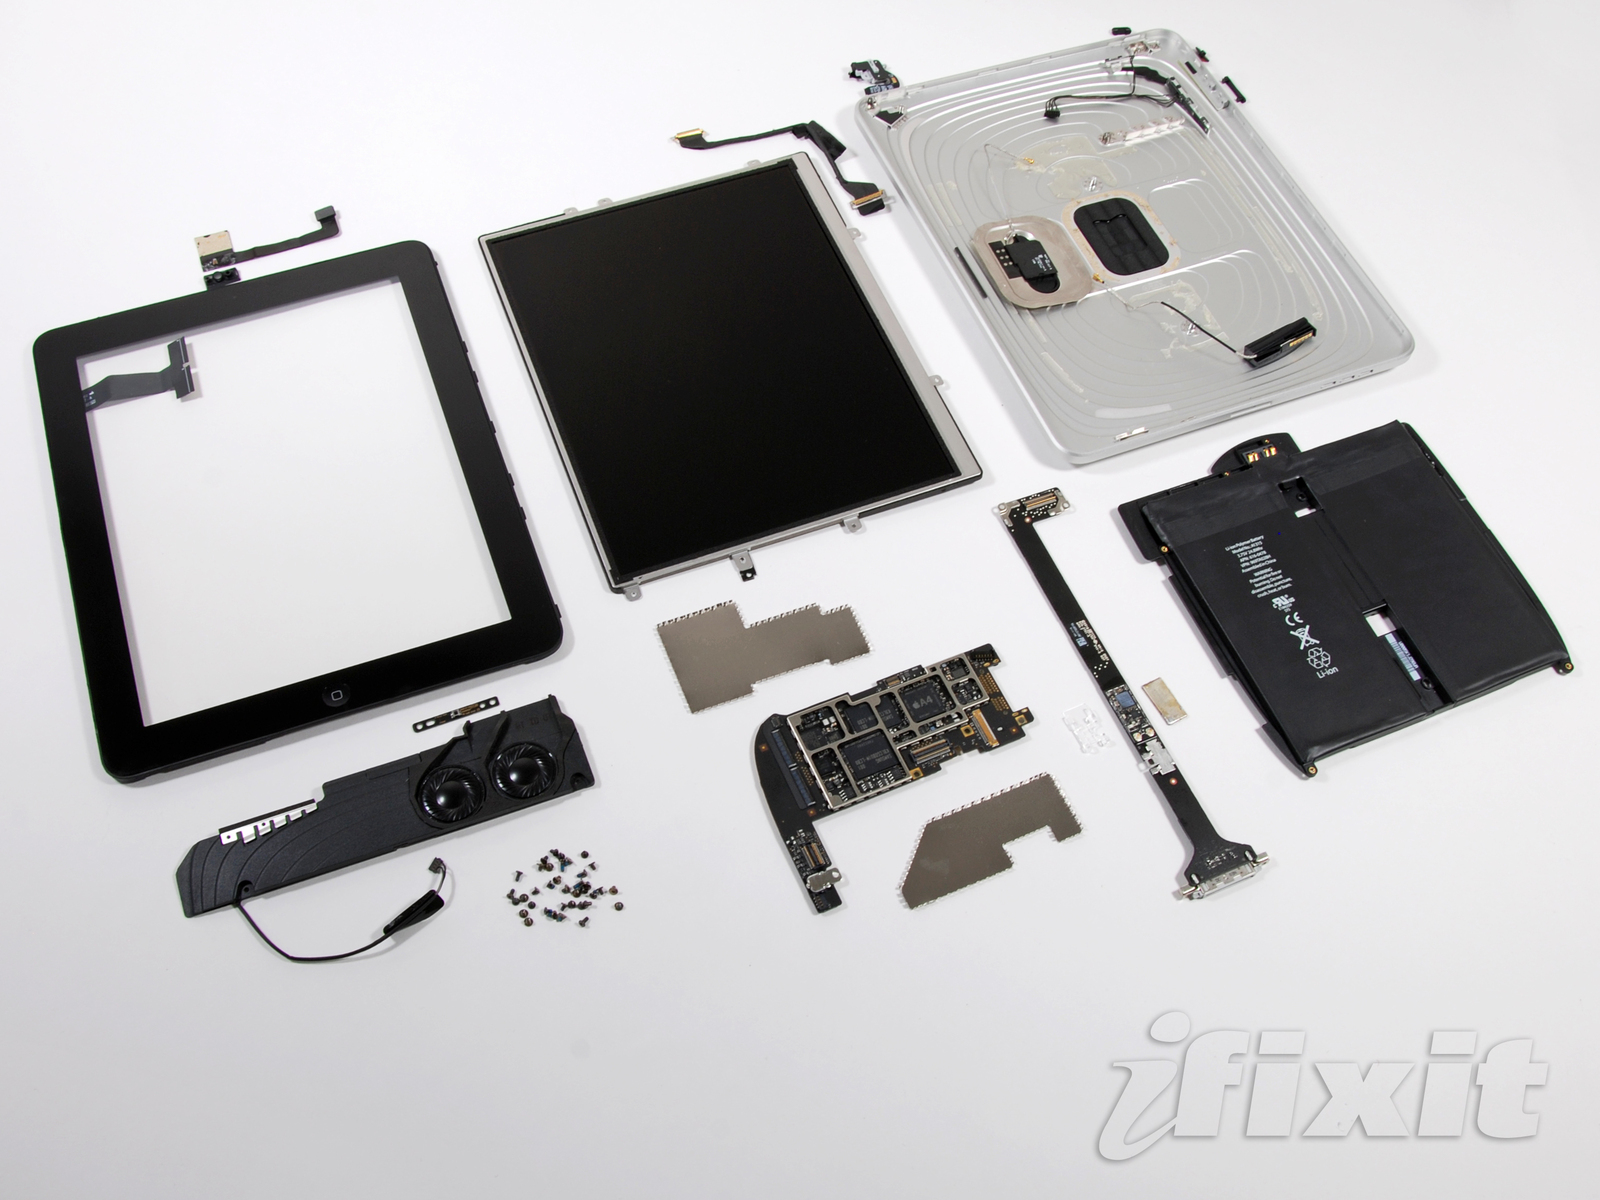 iPad 3G desmontado pela iFixit